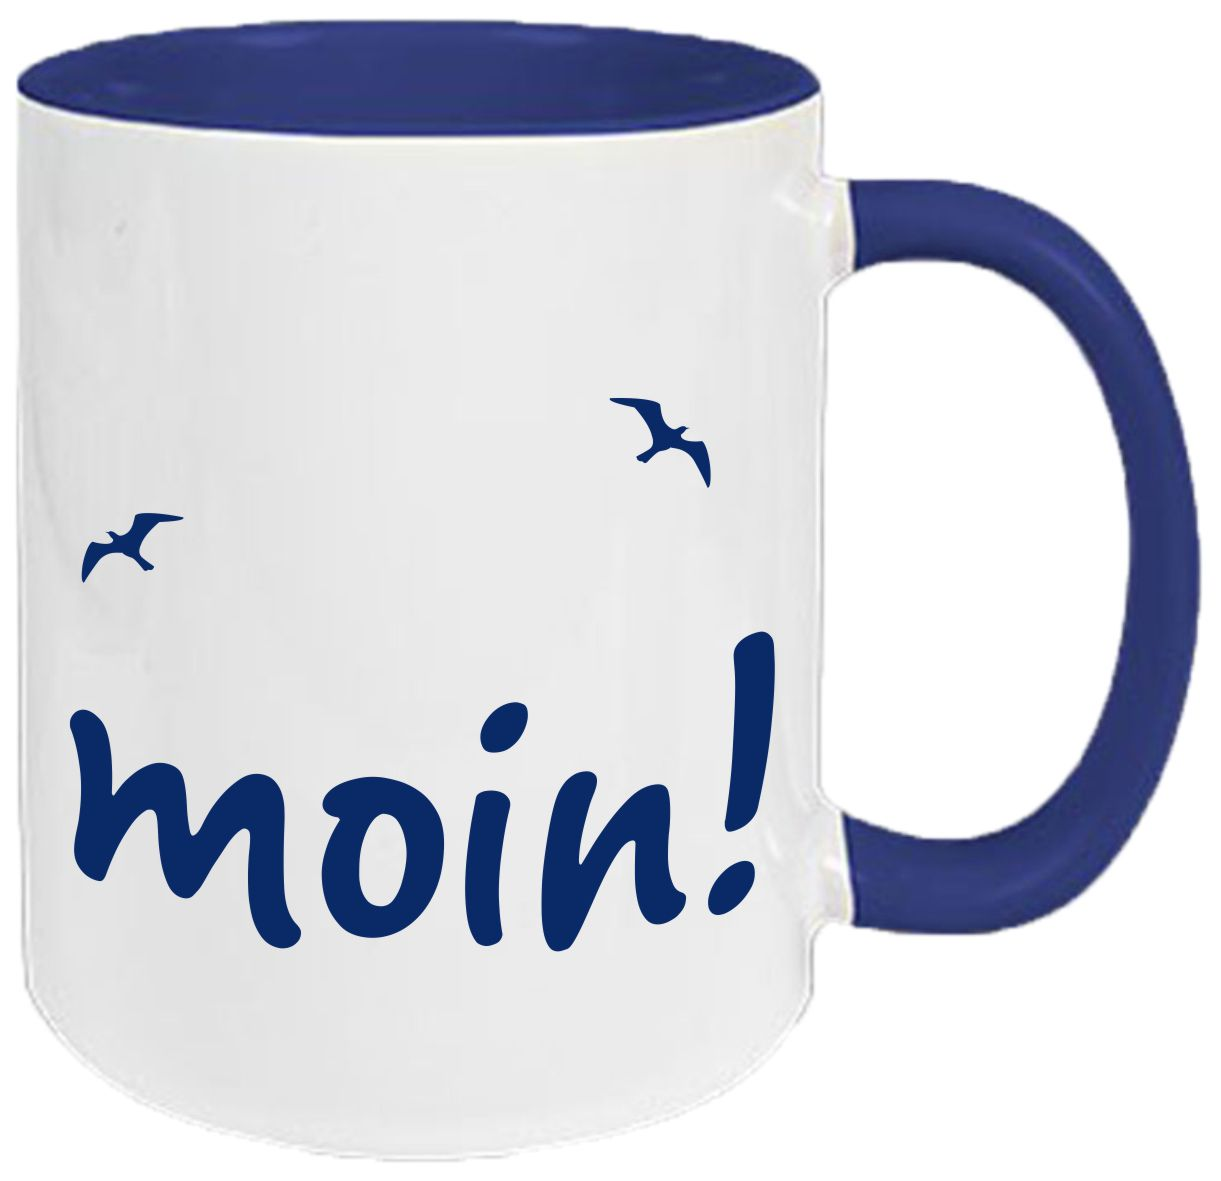 keramiktasse tasse kaffee tee becher navy maritim moin moin tassen tassen schnell. Black Bedroom Furniture Sets. Home Design Ideas